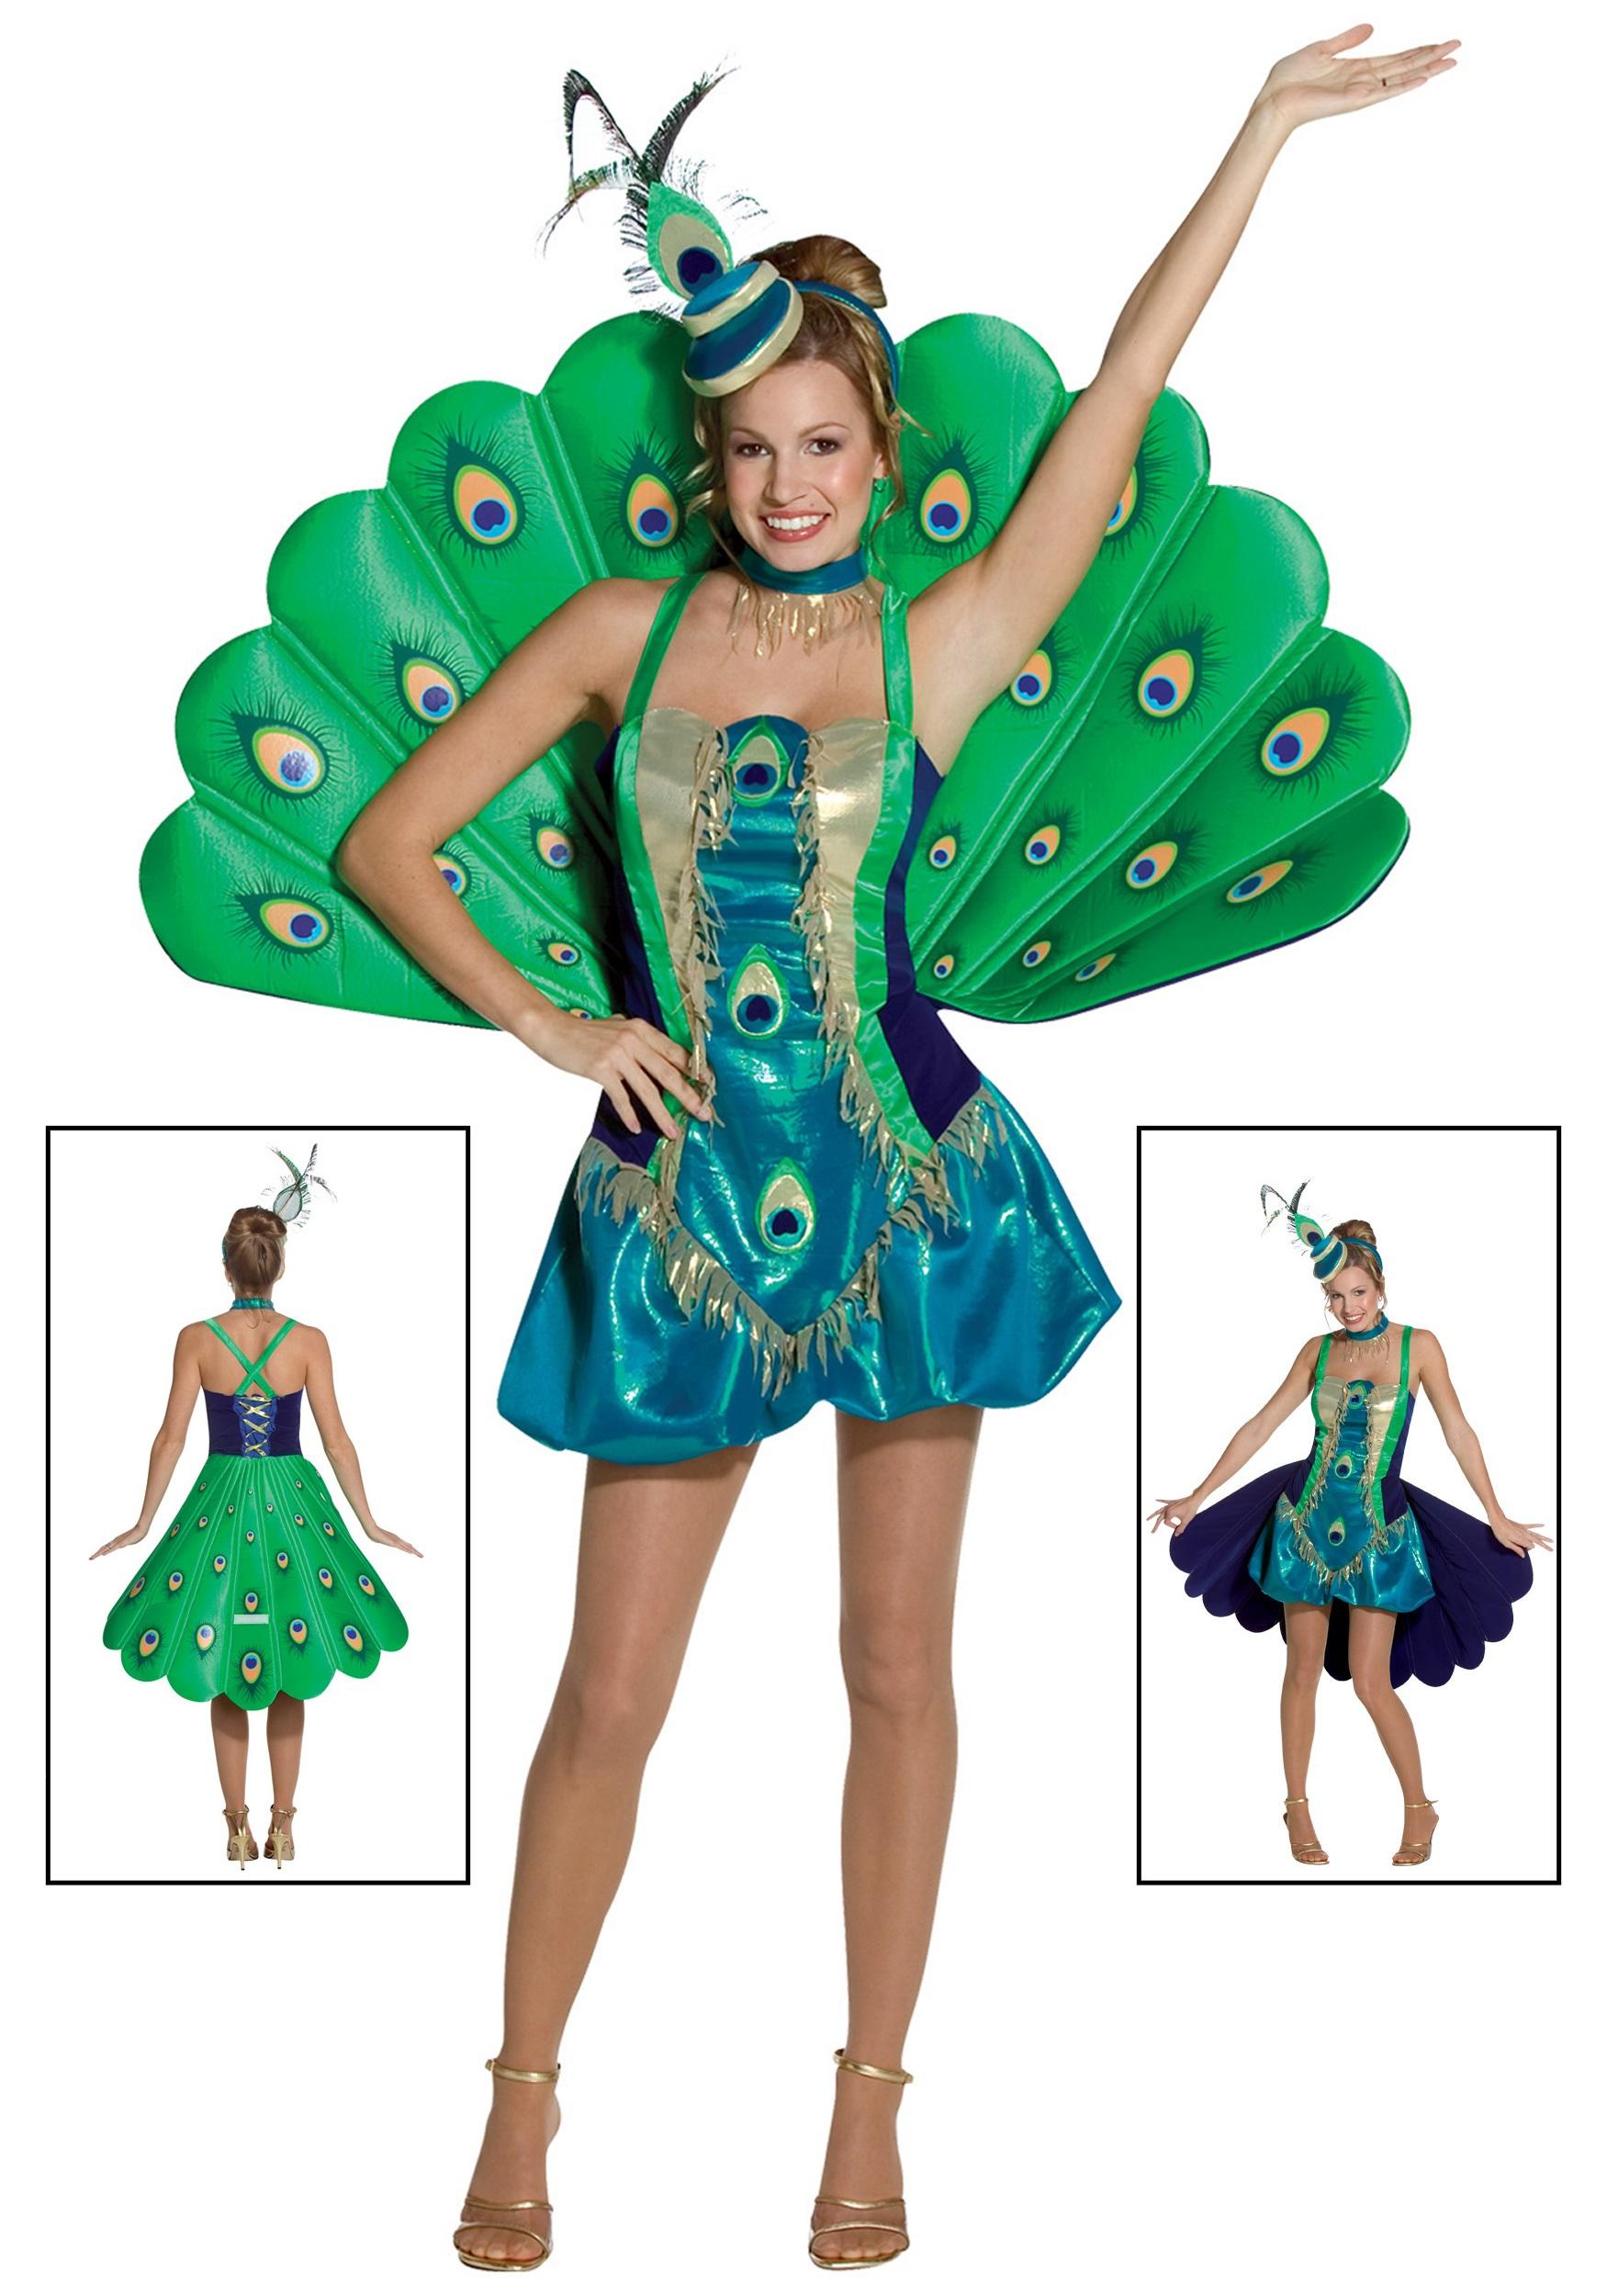 Mardi Gras Costumes - Mardi Gras Halloween Costume Ideas